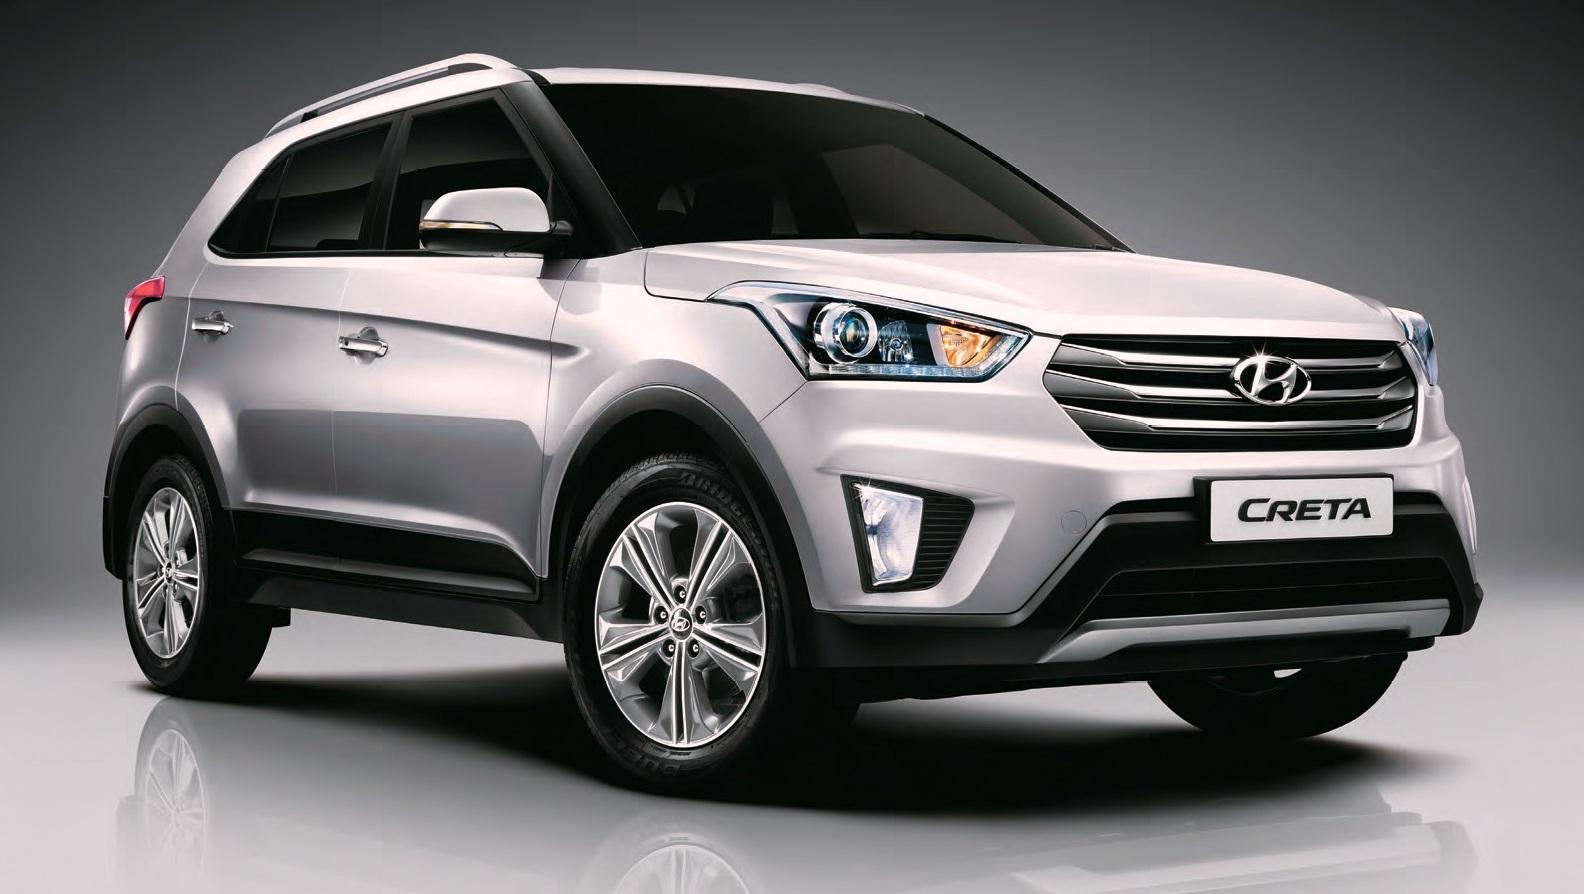 Novo Hyundai Creta 2018 Pre 231 O Consumo Ficha T 233 Cnica